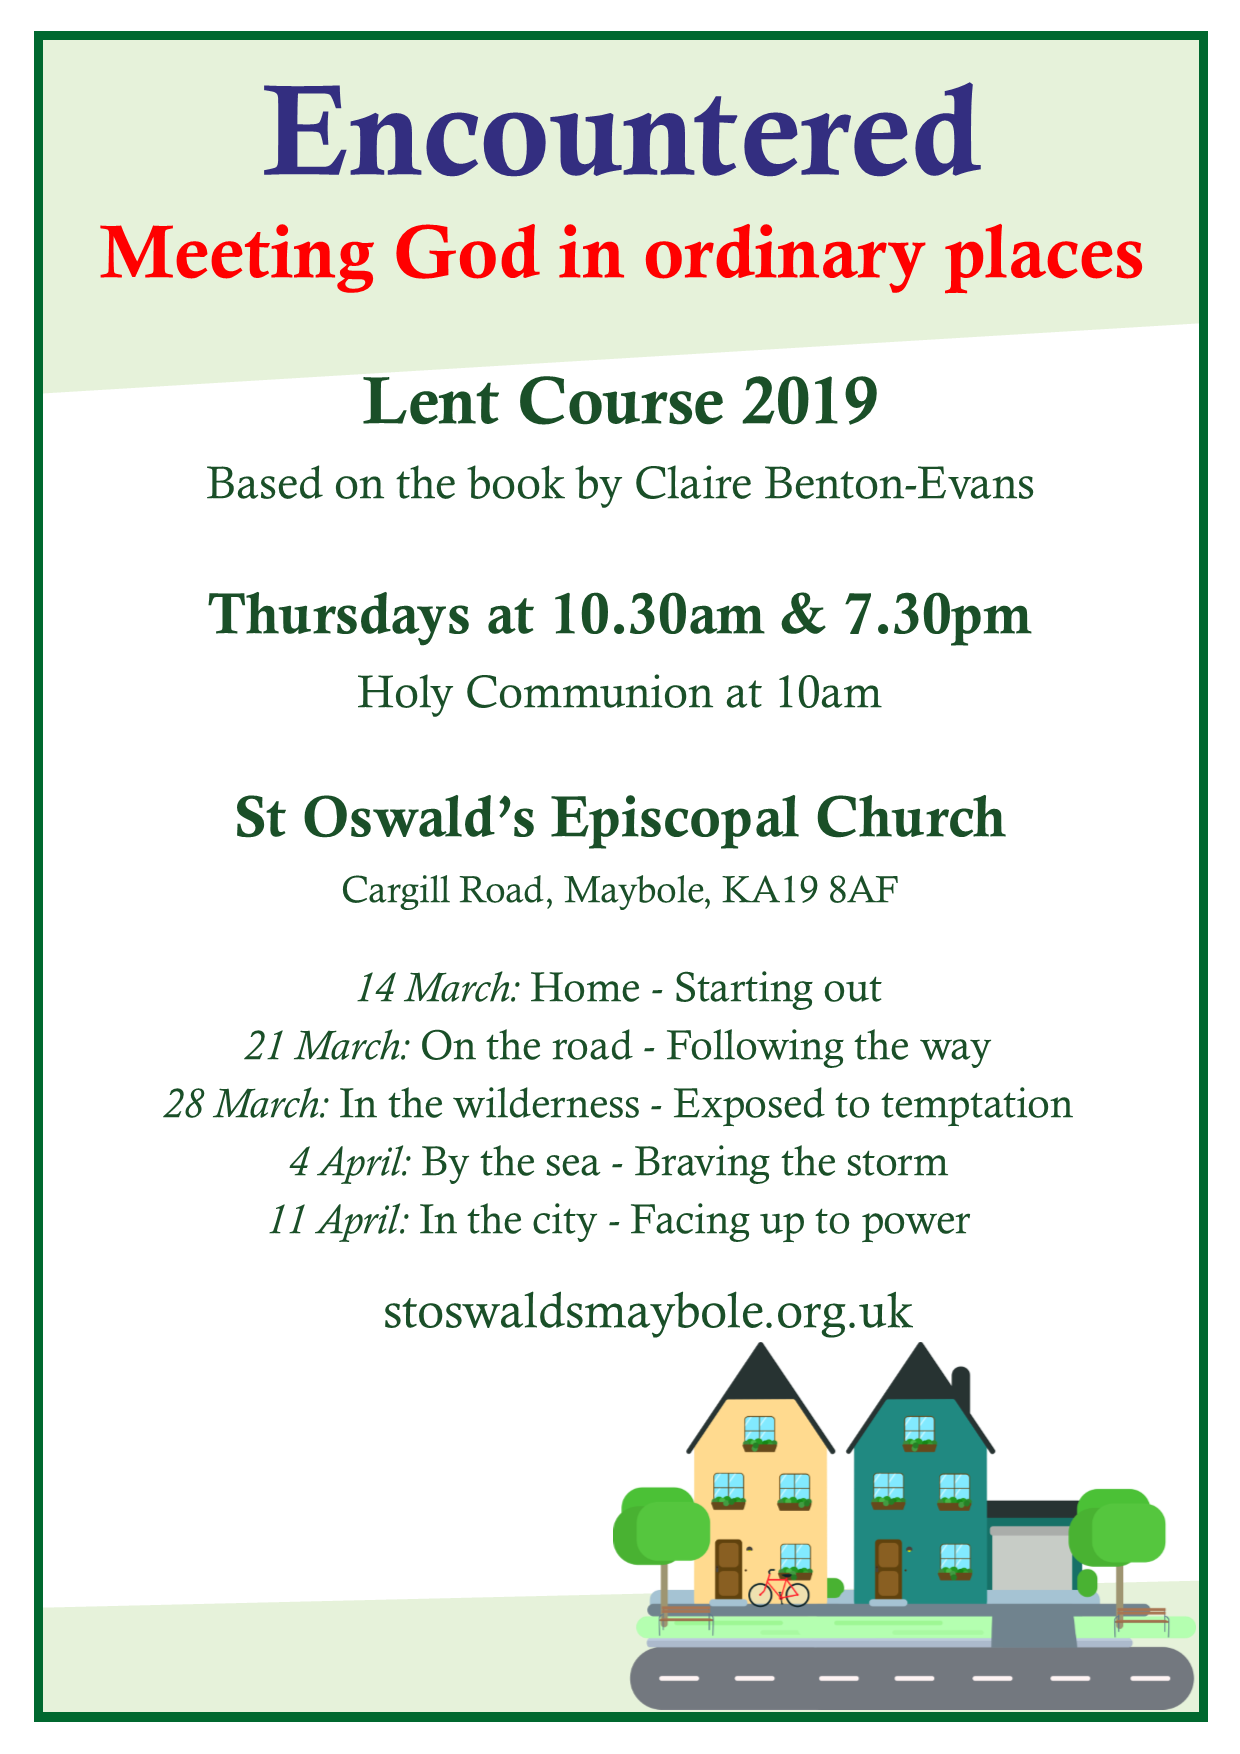 Lent Course @ St Oswald's Church